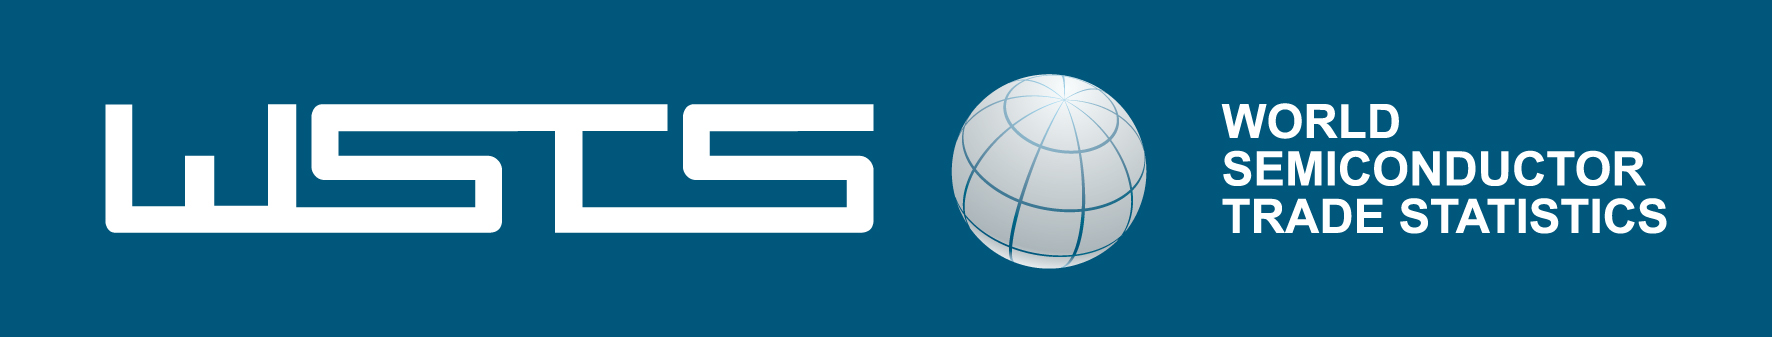 logo for World Semiconductor Trade Statistics